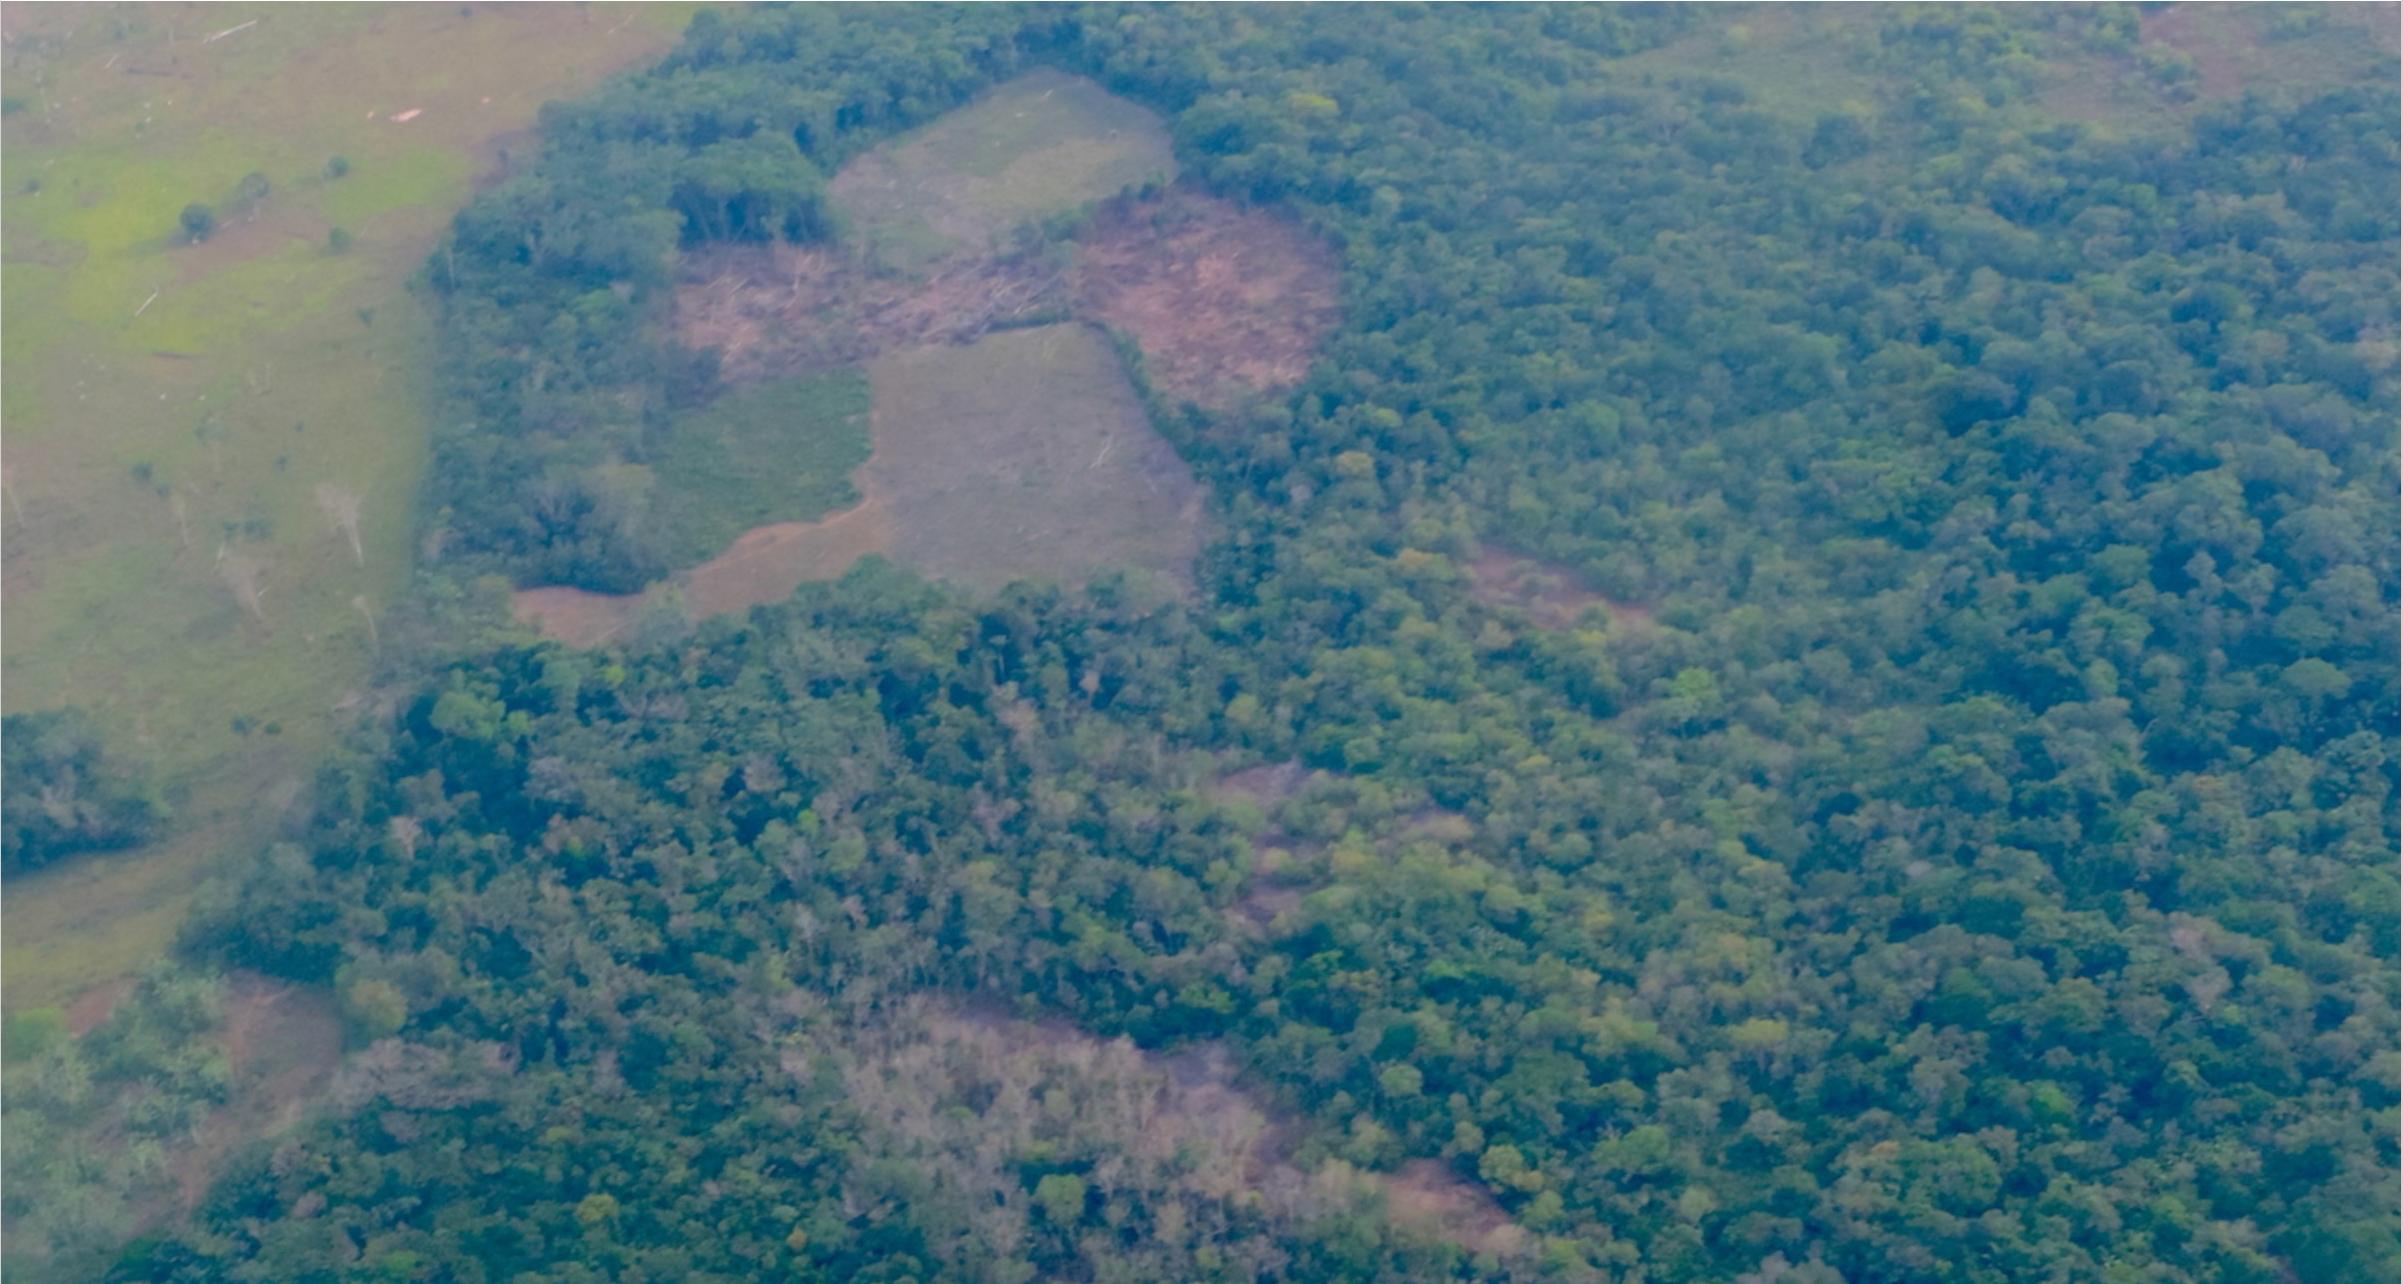 colombia-coca-plantations